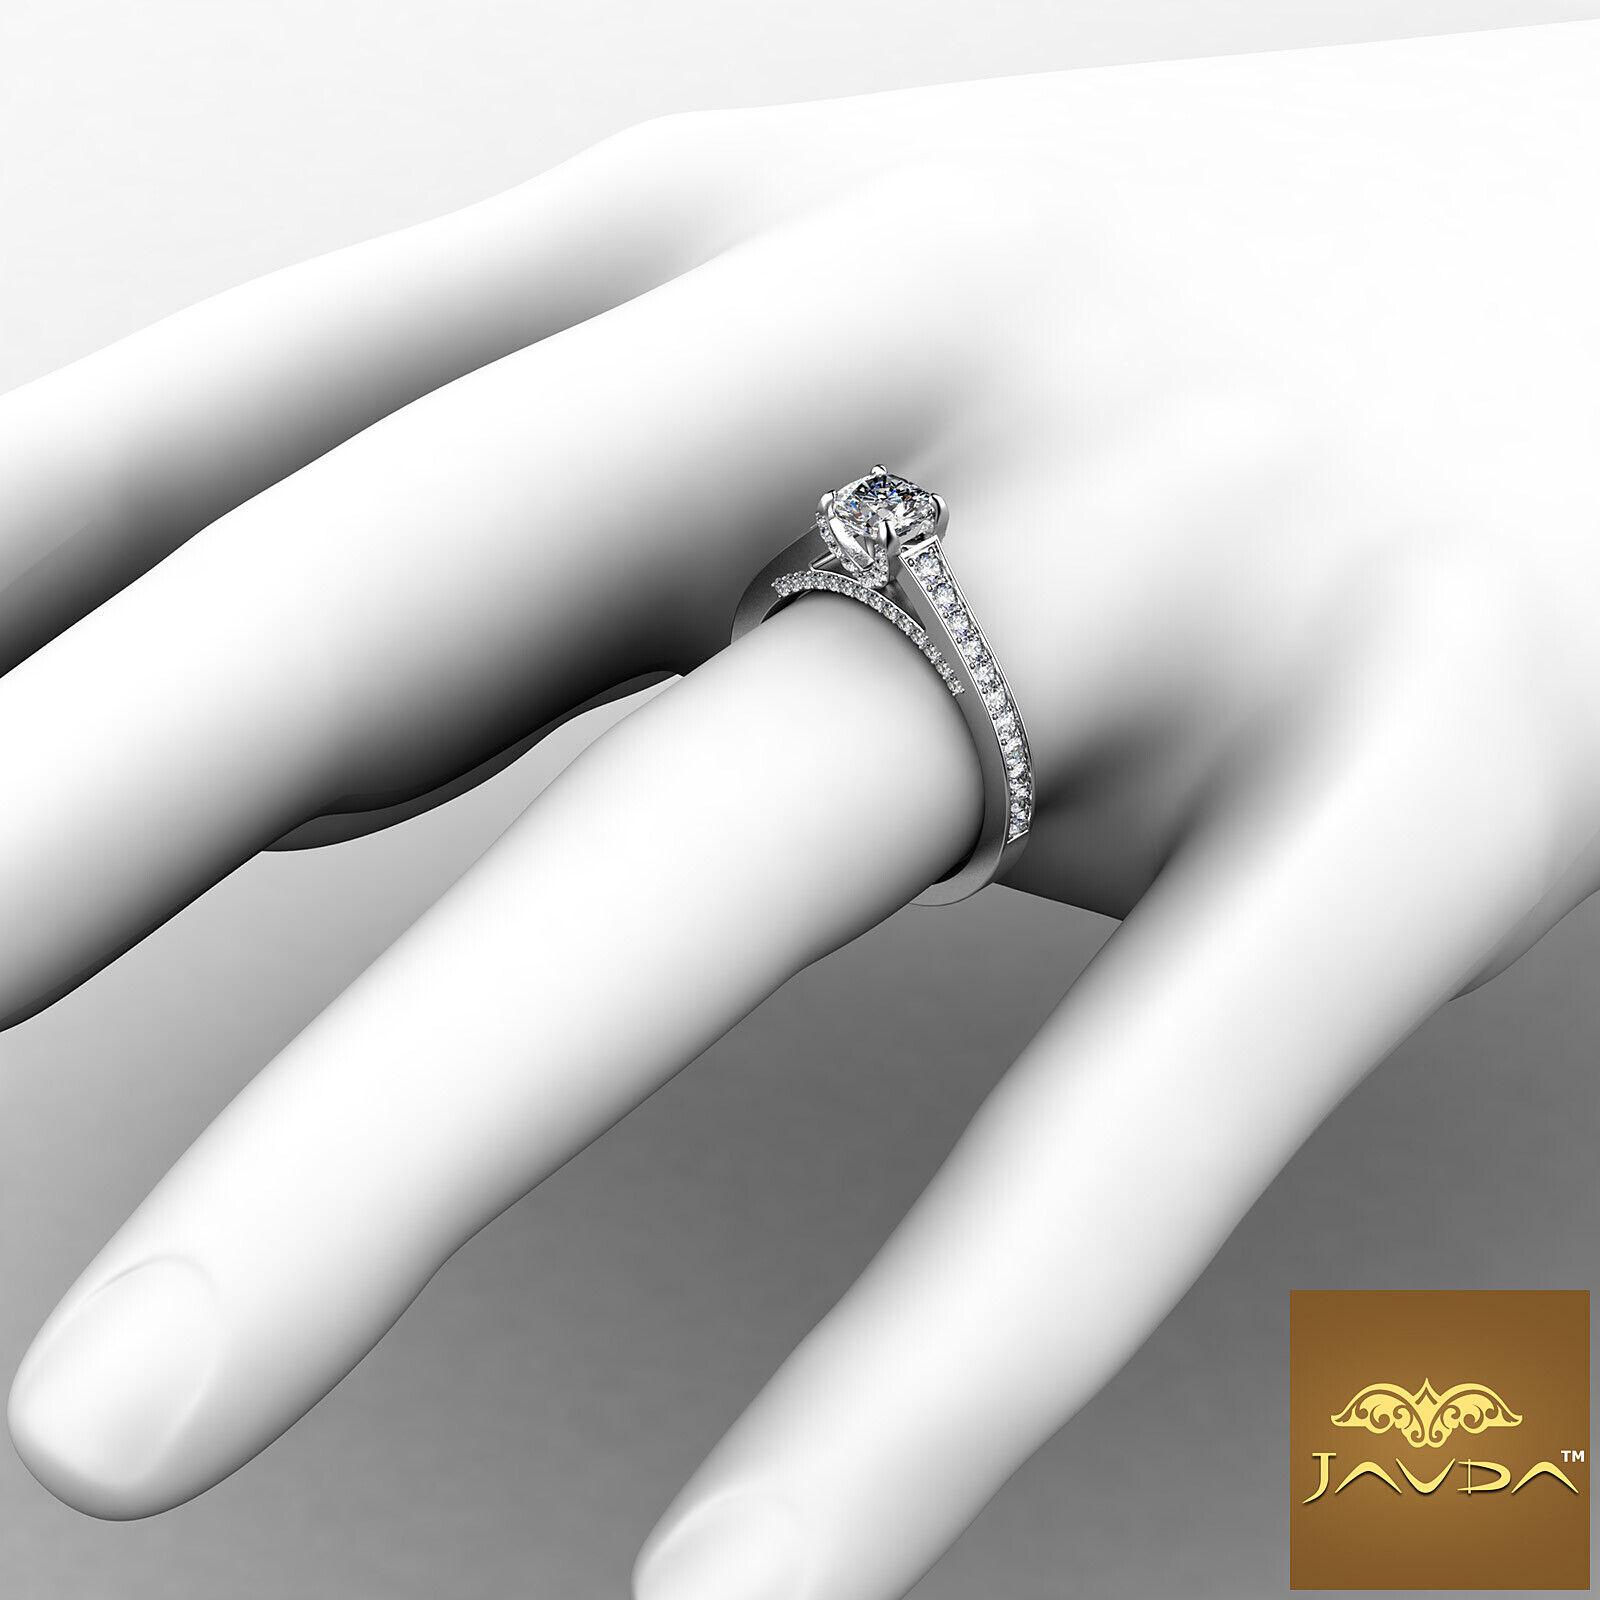 Cushion Cut Diamond Flawless Engagement GIA G VVS2 Pave Set Ring Platinum 1.25Ct 3